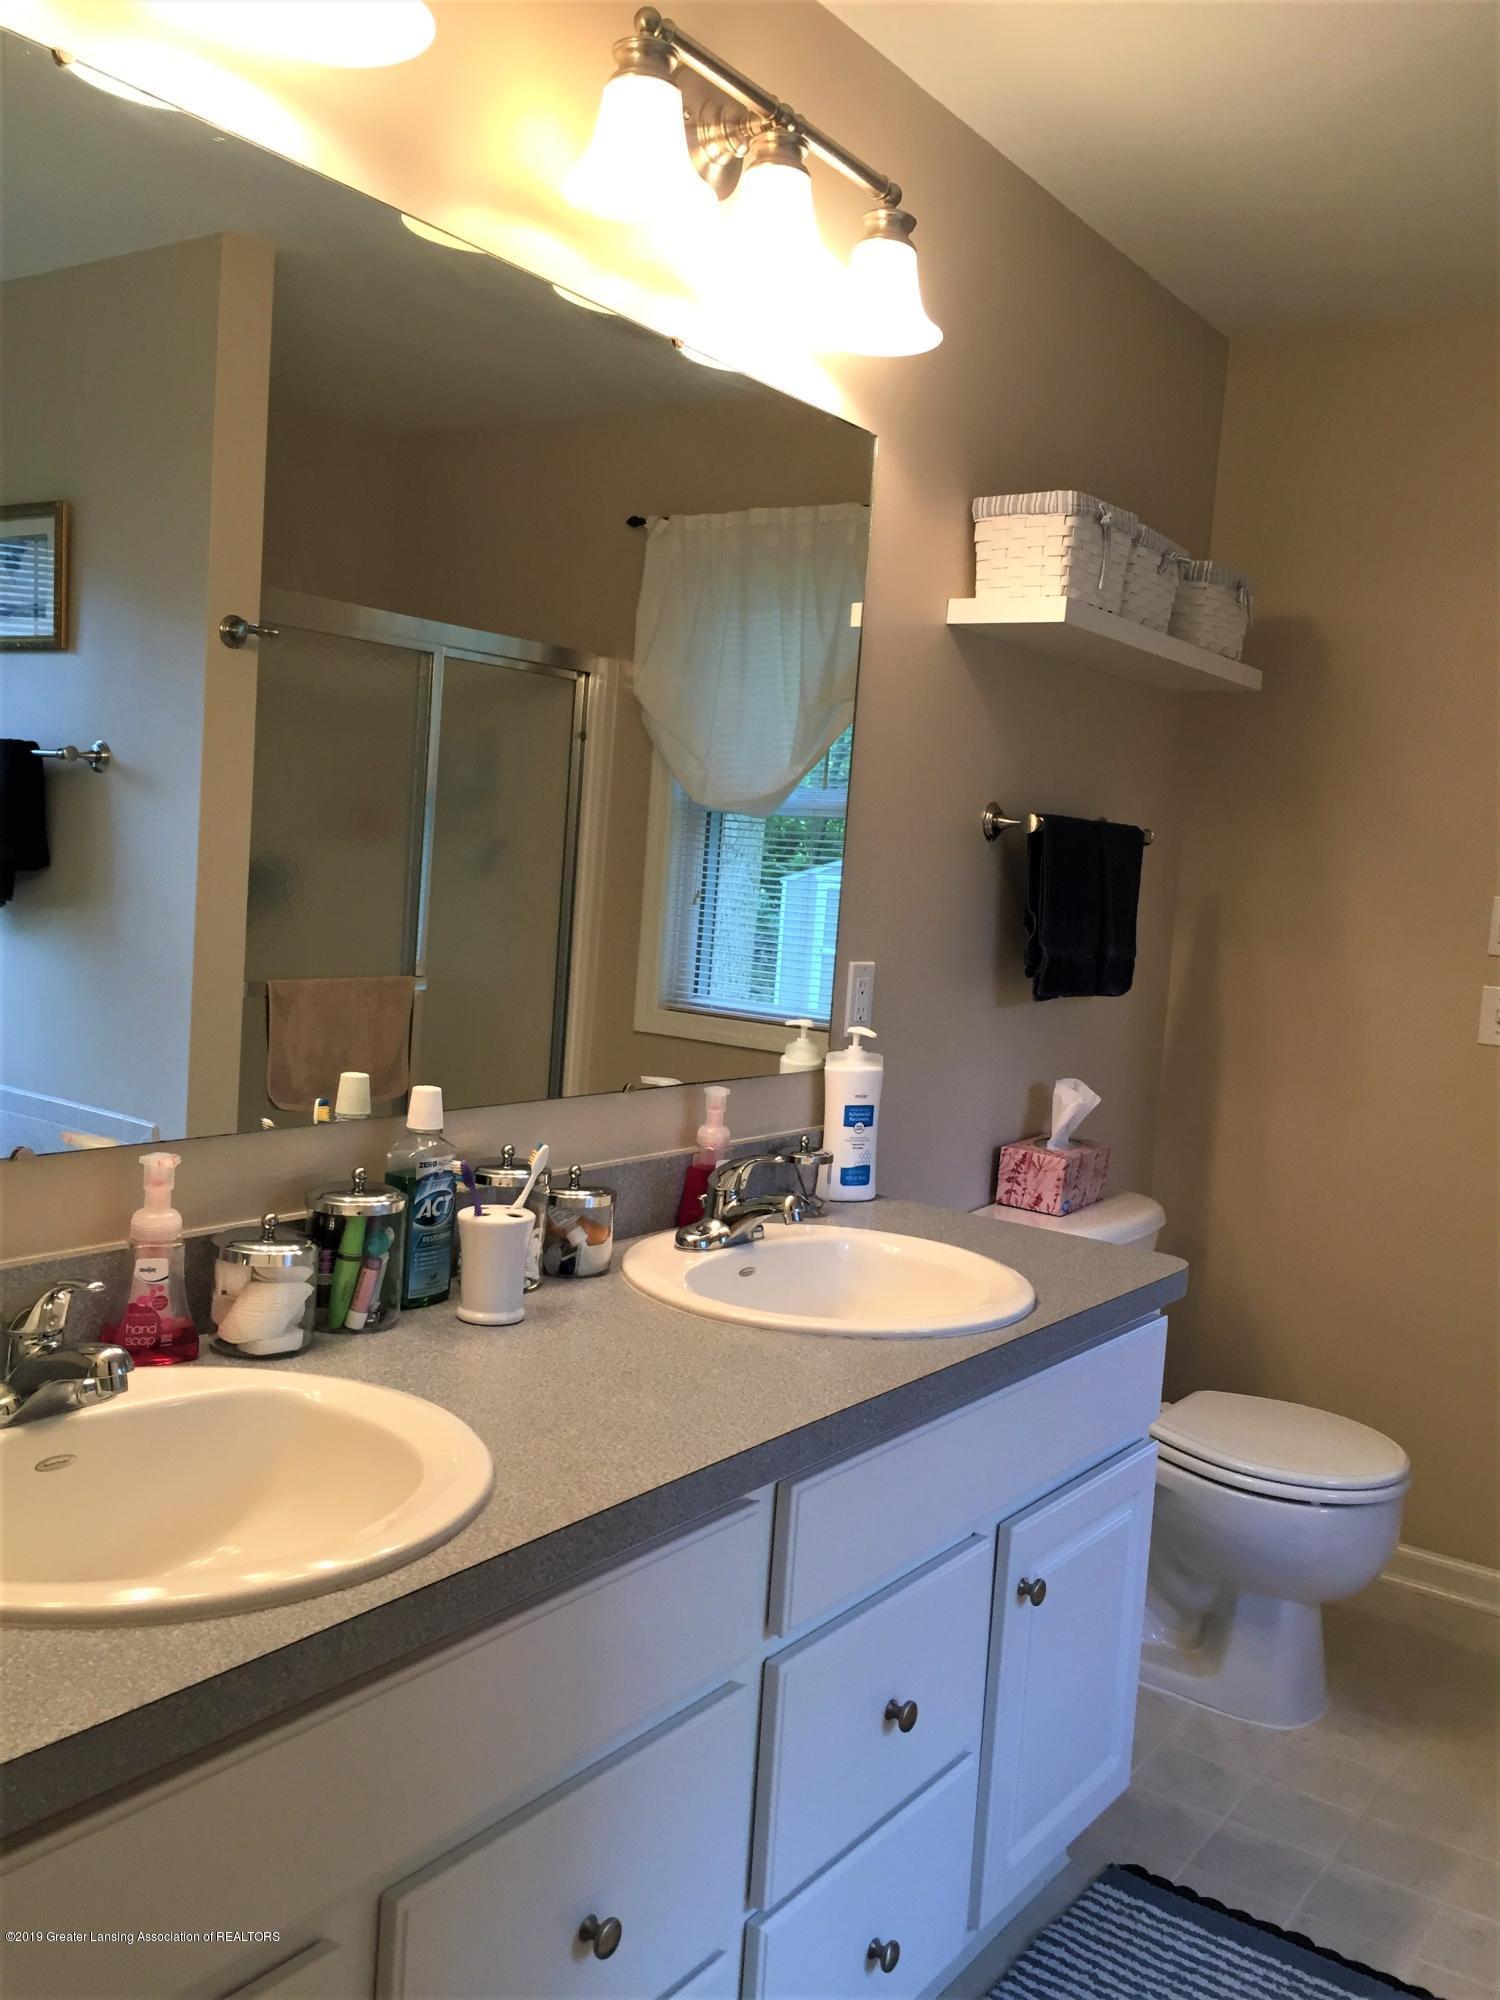 8617 Wheatdale Dr - Master Bathroom - 26